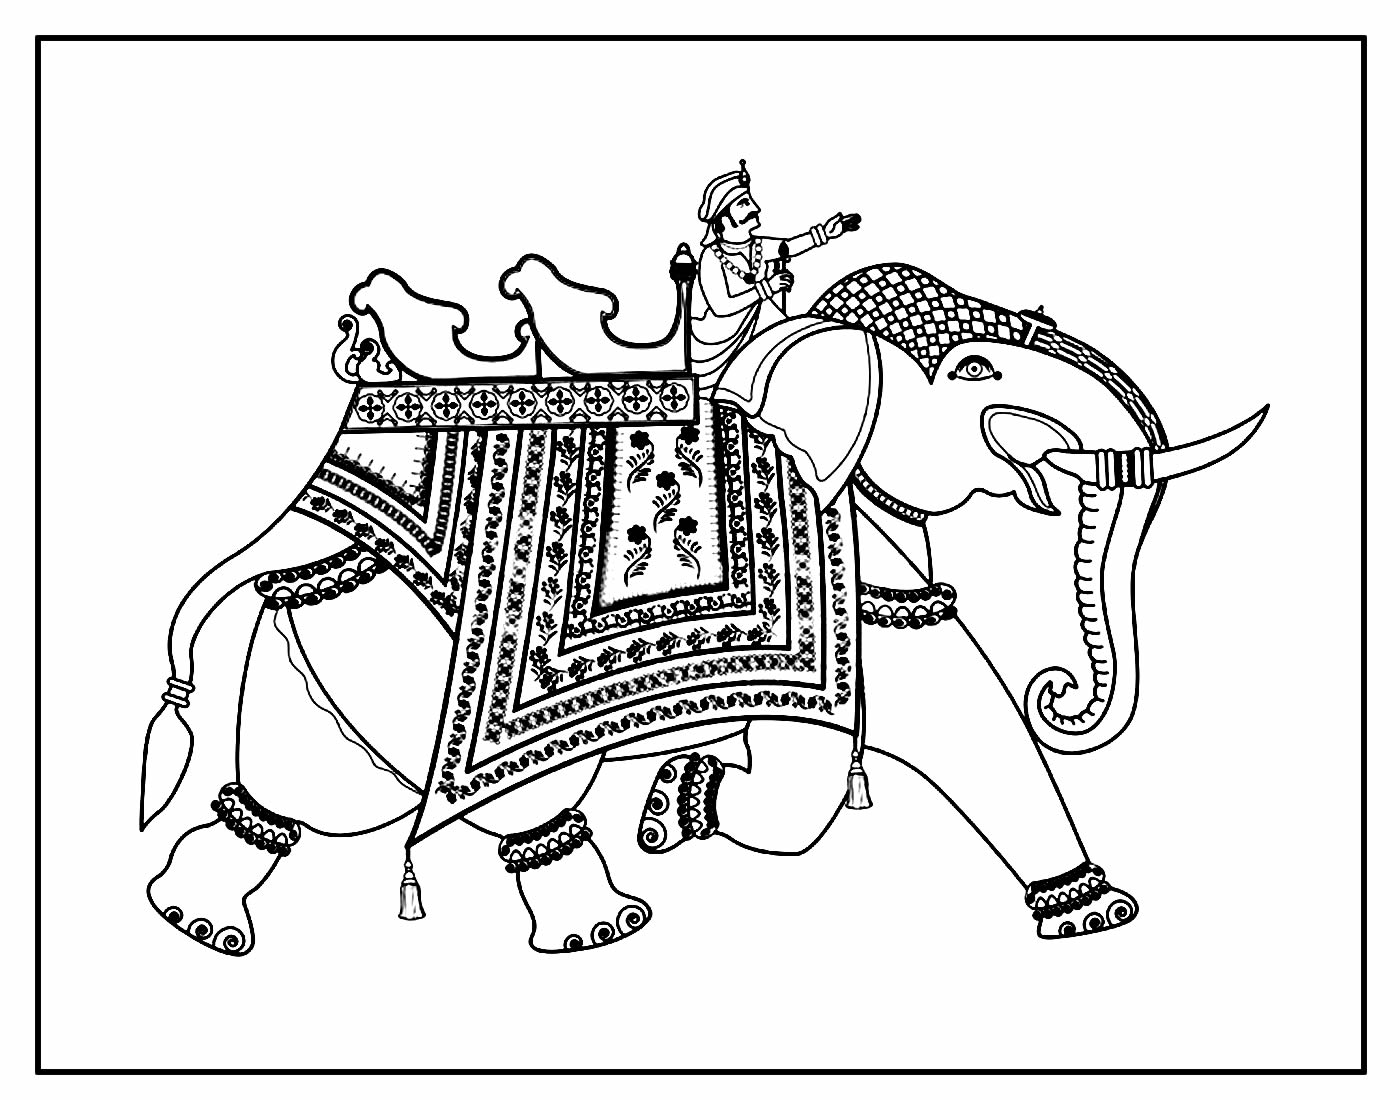 Desenho para colorir de Elefante Indiano